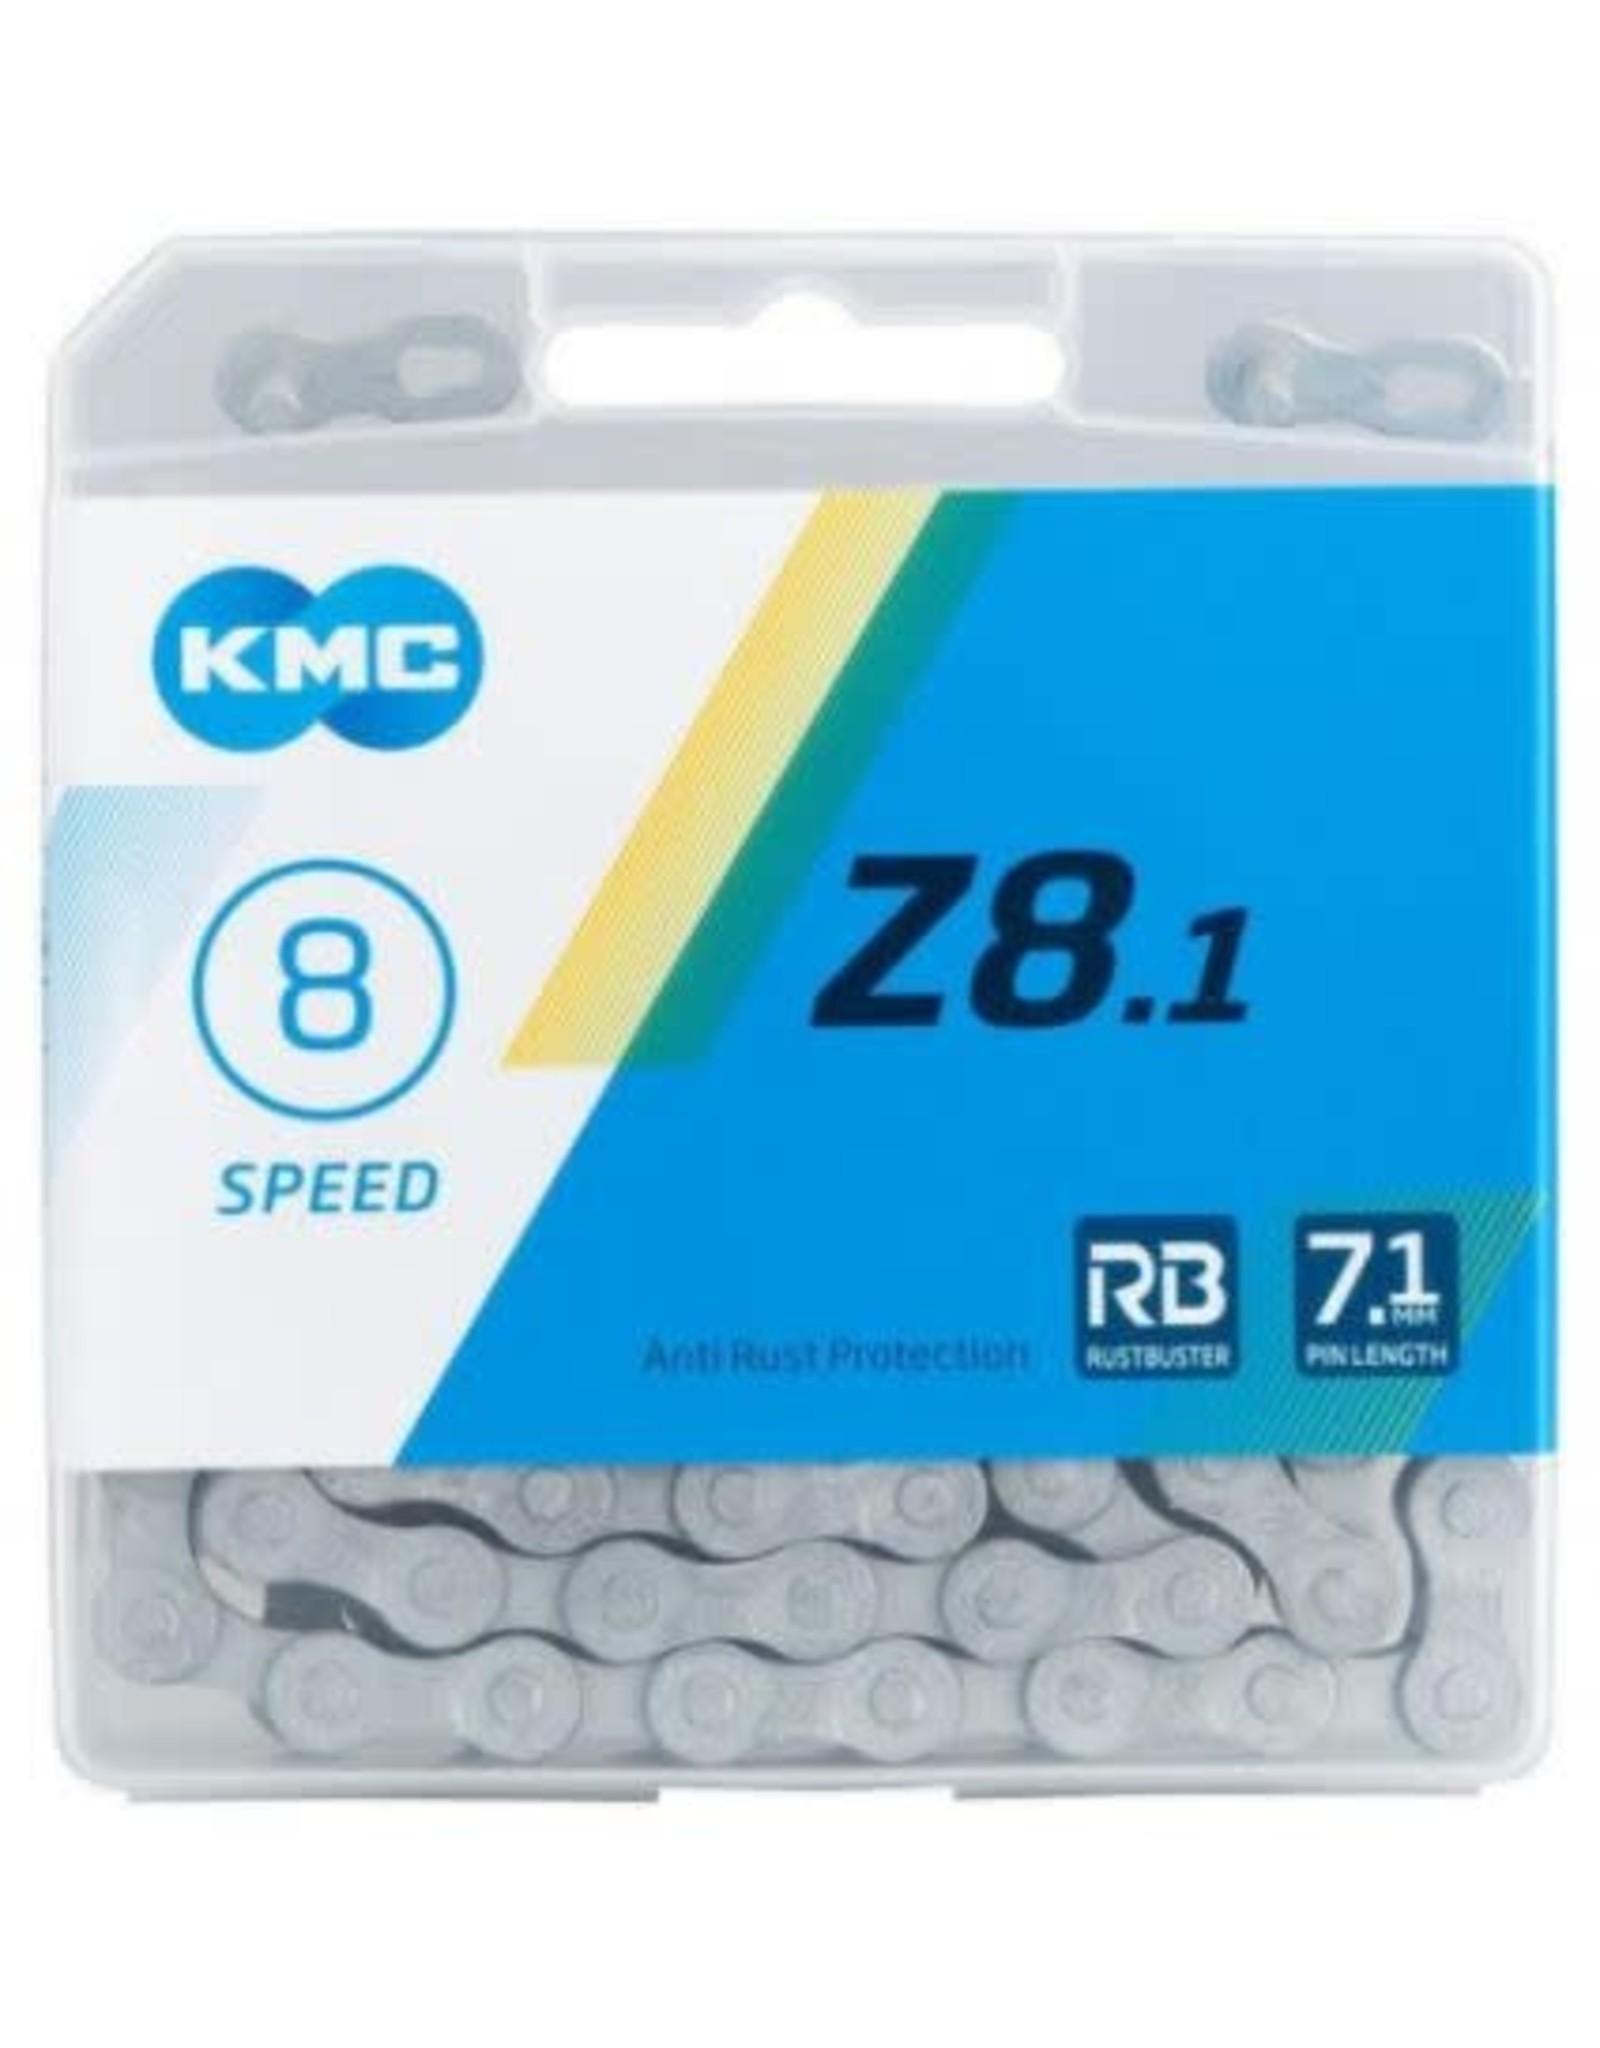 KMC Chain KMC Z8.1 6/7/8s anti rust protection 116 links